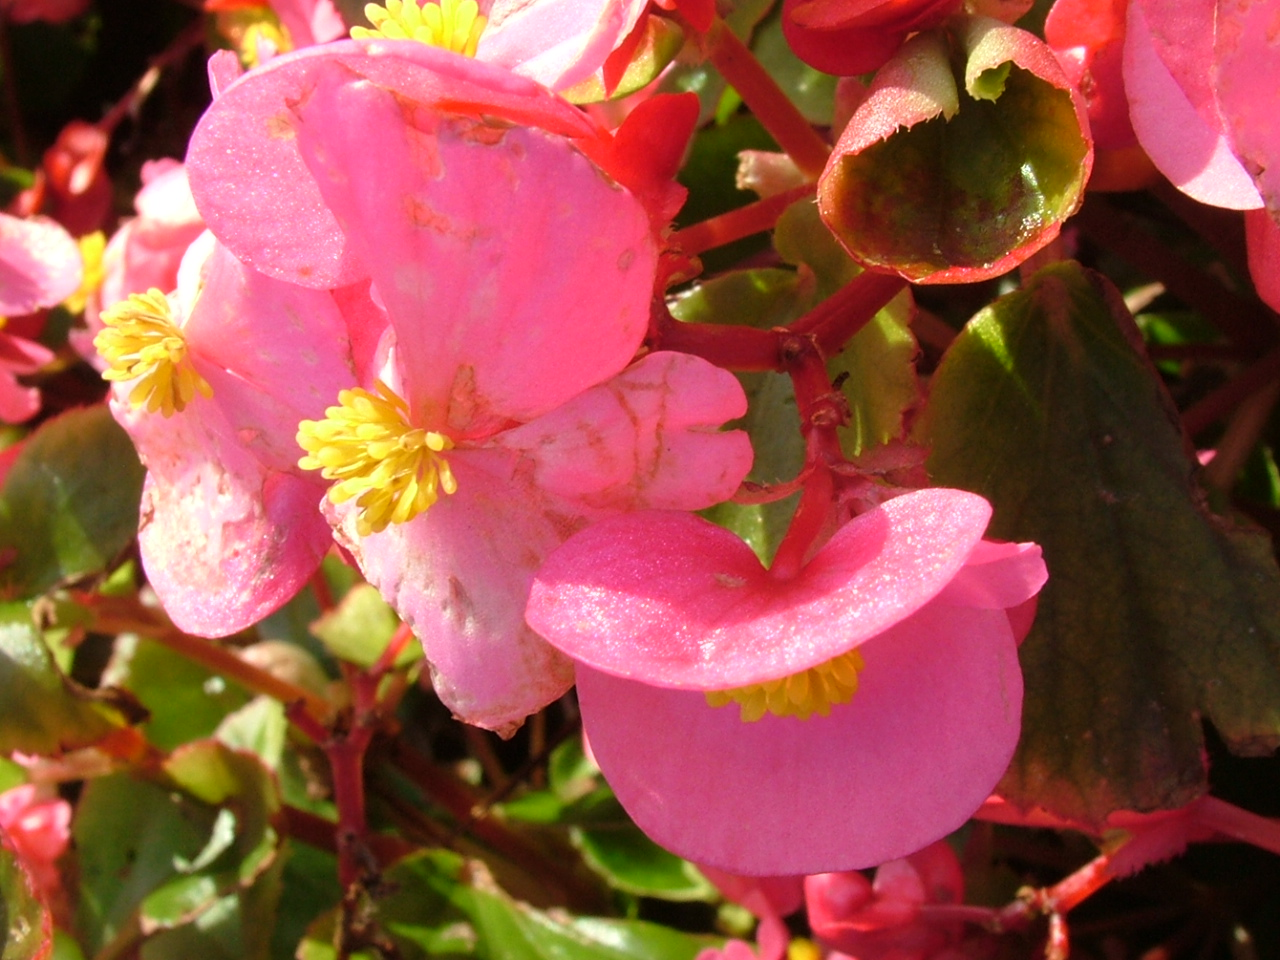 Begonia Flowers Image